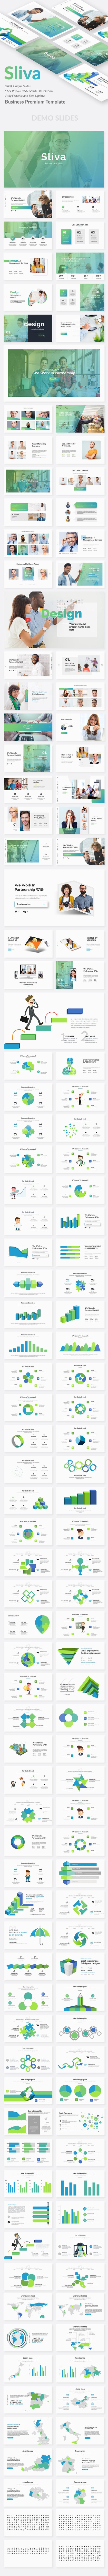 Sliva Business Powerpoint Template - Business PowerPoint Templates